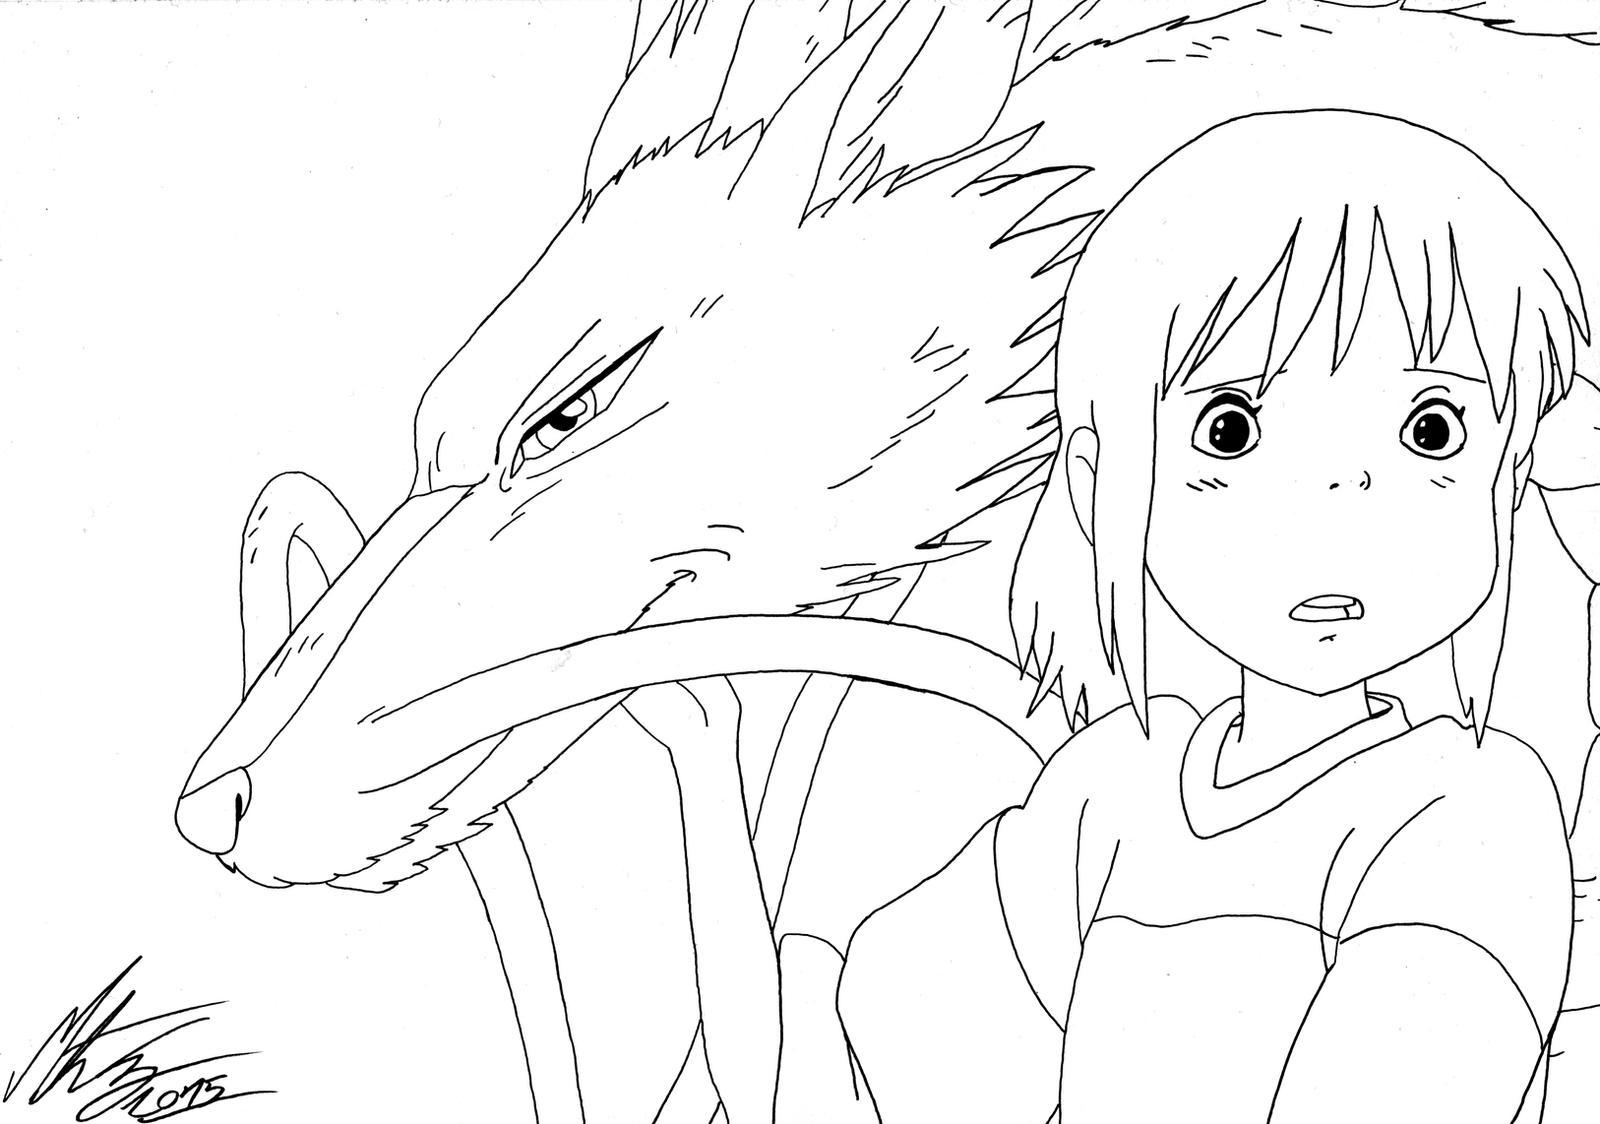 Studio Ghibli - Spirited Away by MortenEng21 on DeviantArt